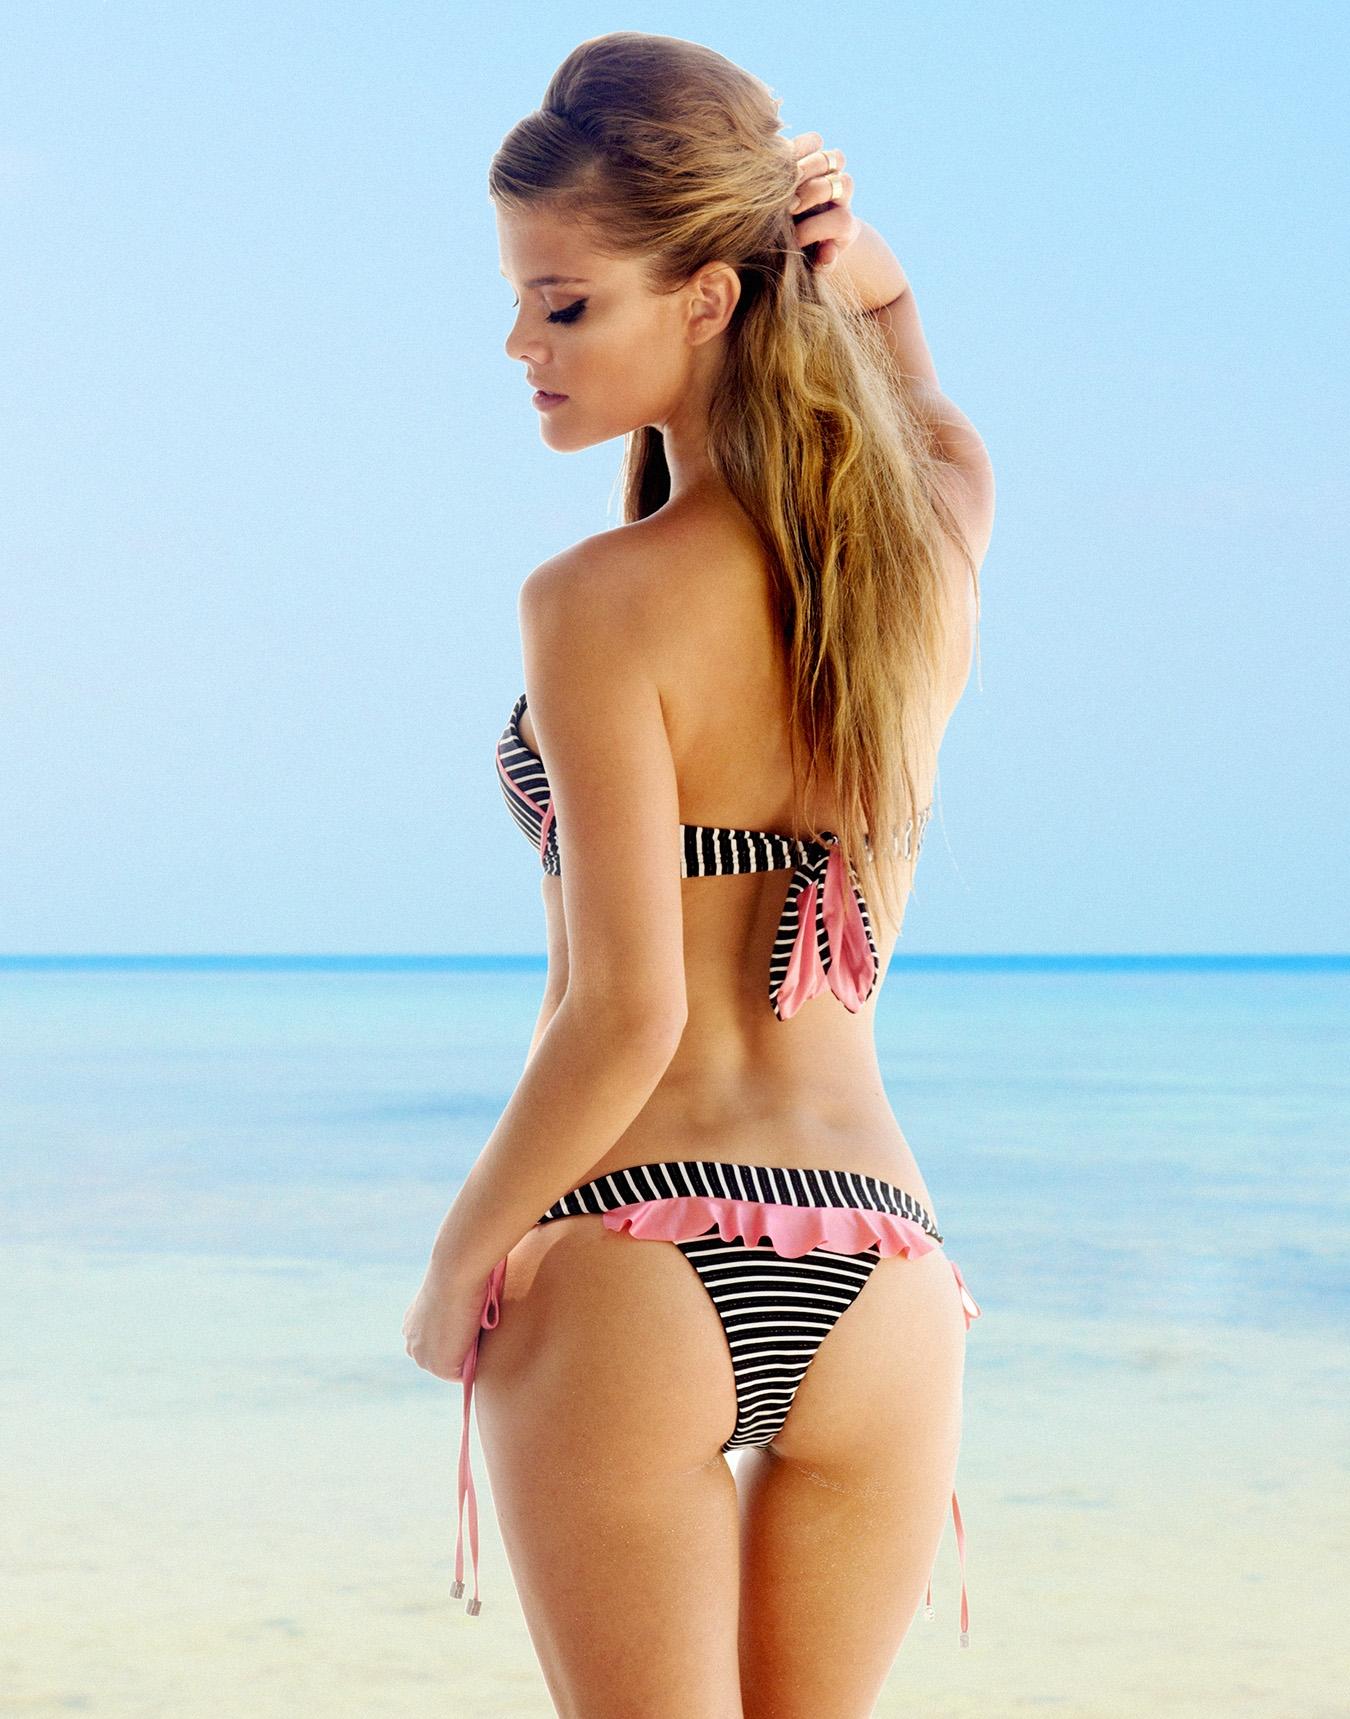 Forget me not bikini